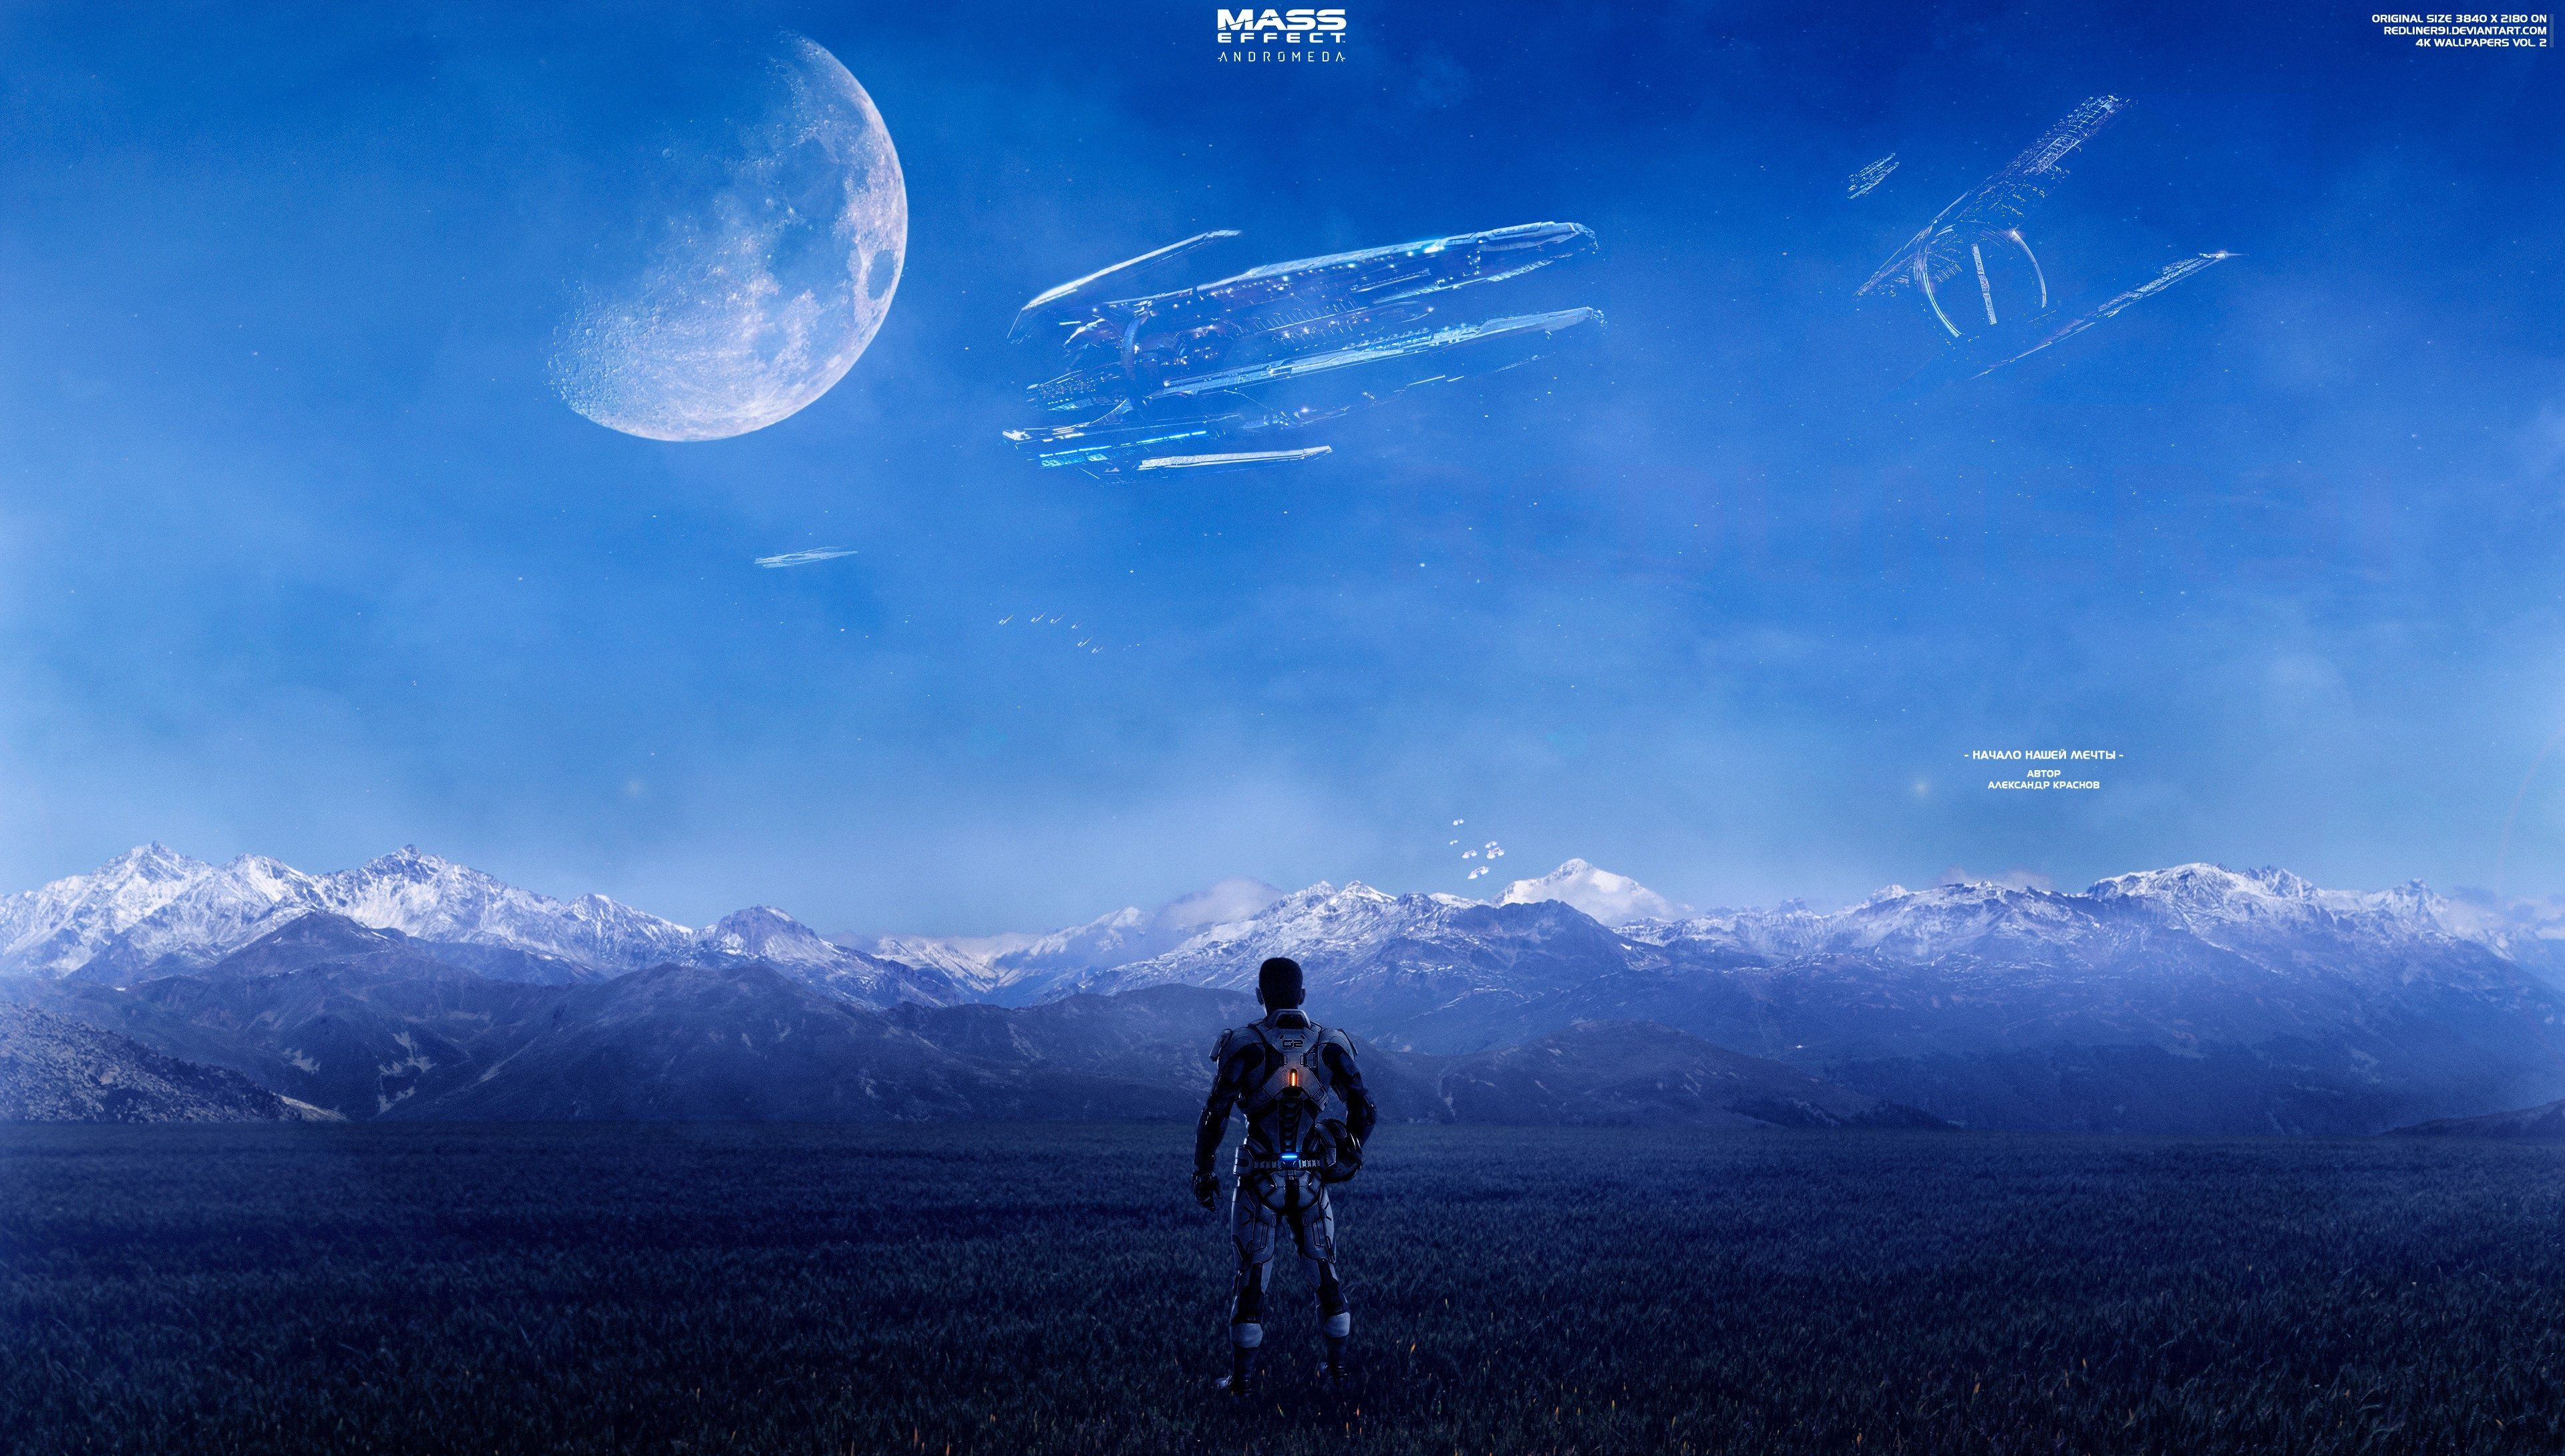 3840x2180 Mass Effect Andromeda 4k Wallpaper For Desktop Hd Mass Effect Background Images Wallpaper Backgrounds